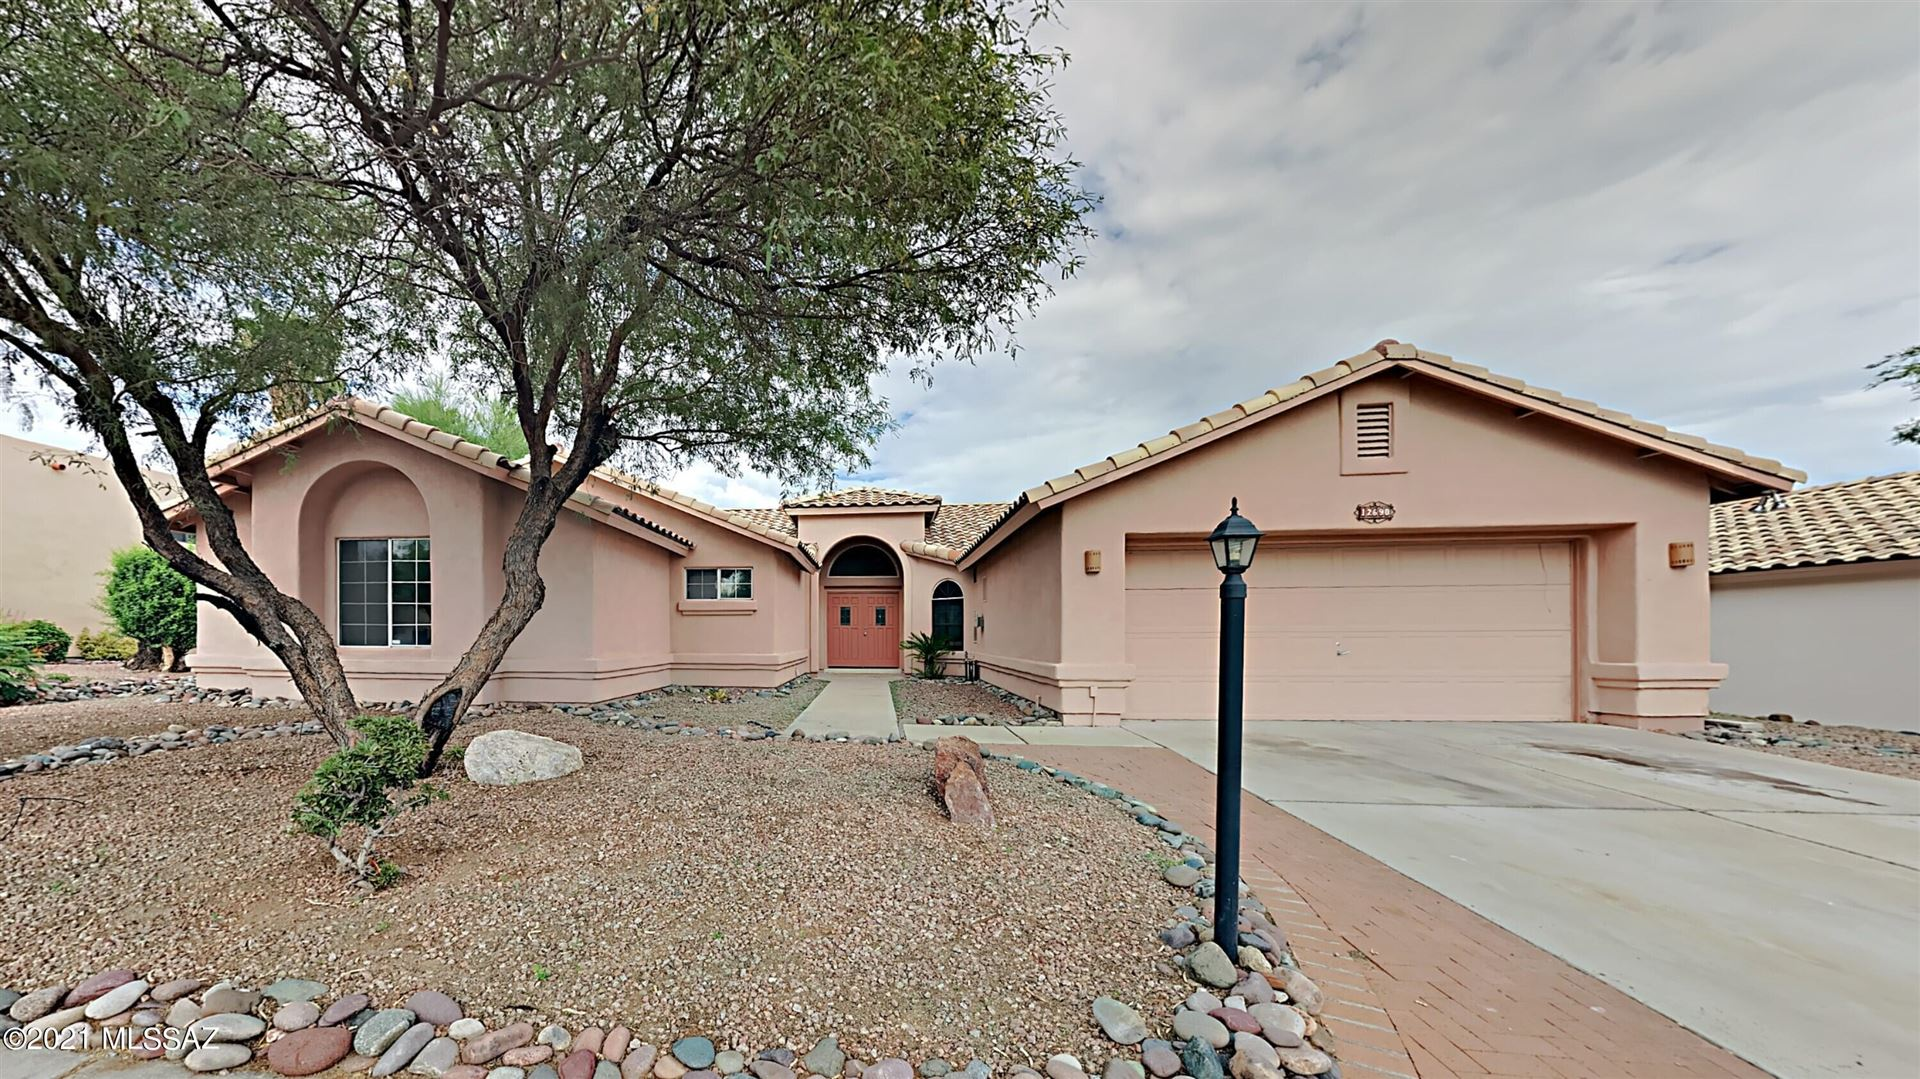 12690 N Bandanna Way, Oro Valley, AZ 85755 - MLS#: 22120642